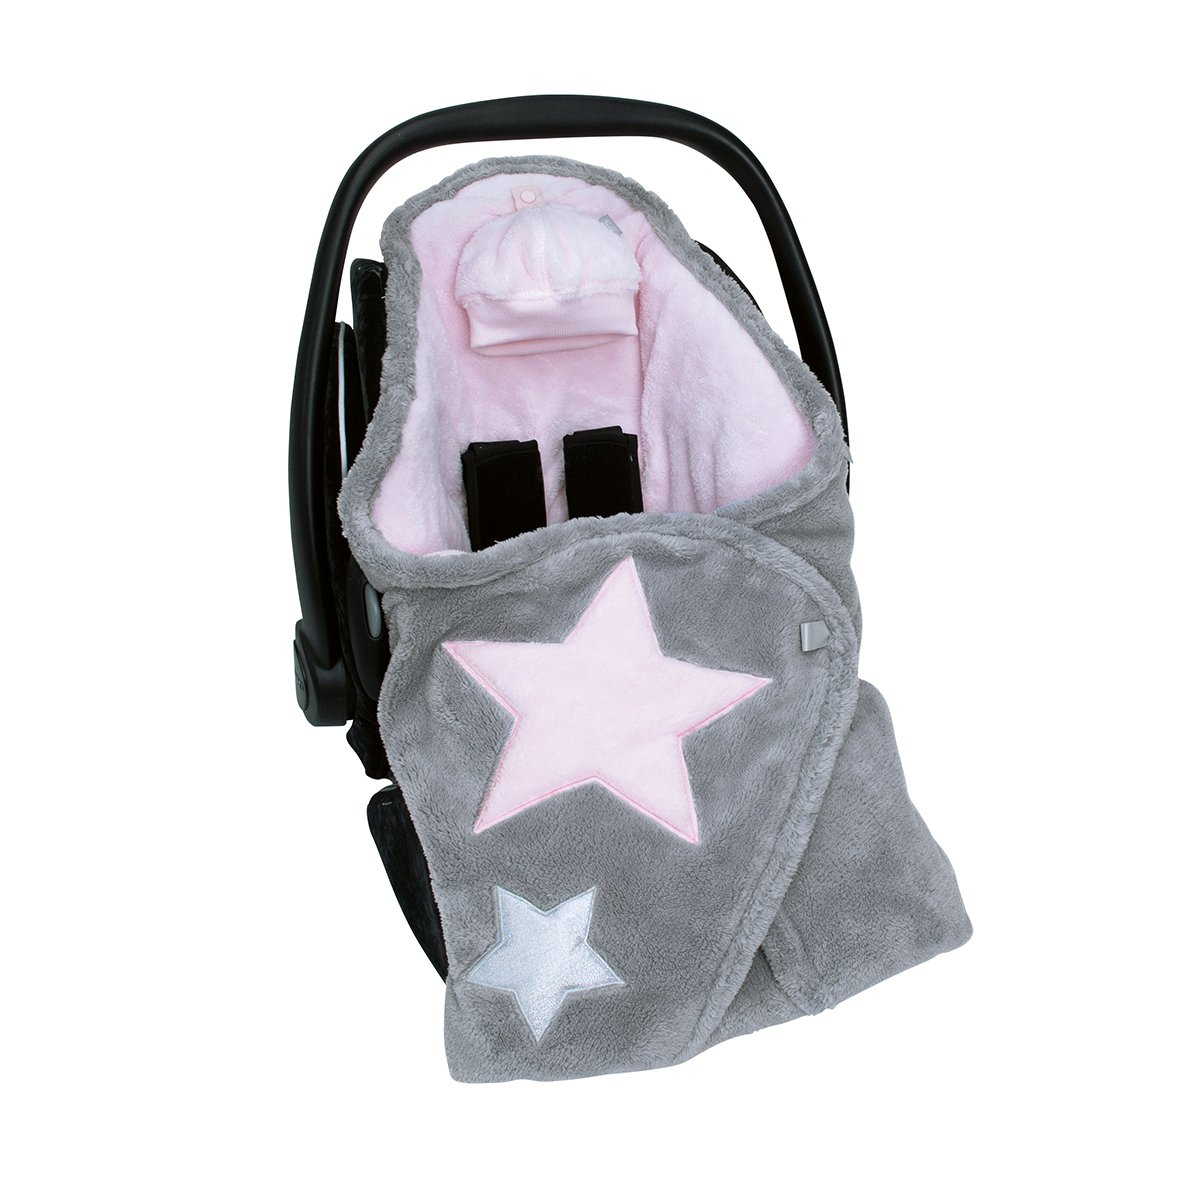 Bemini by Baby Boum 392STARY54SF Decke Biside Softy Stary Cristal rosa 90 x 90 cm